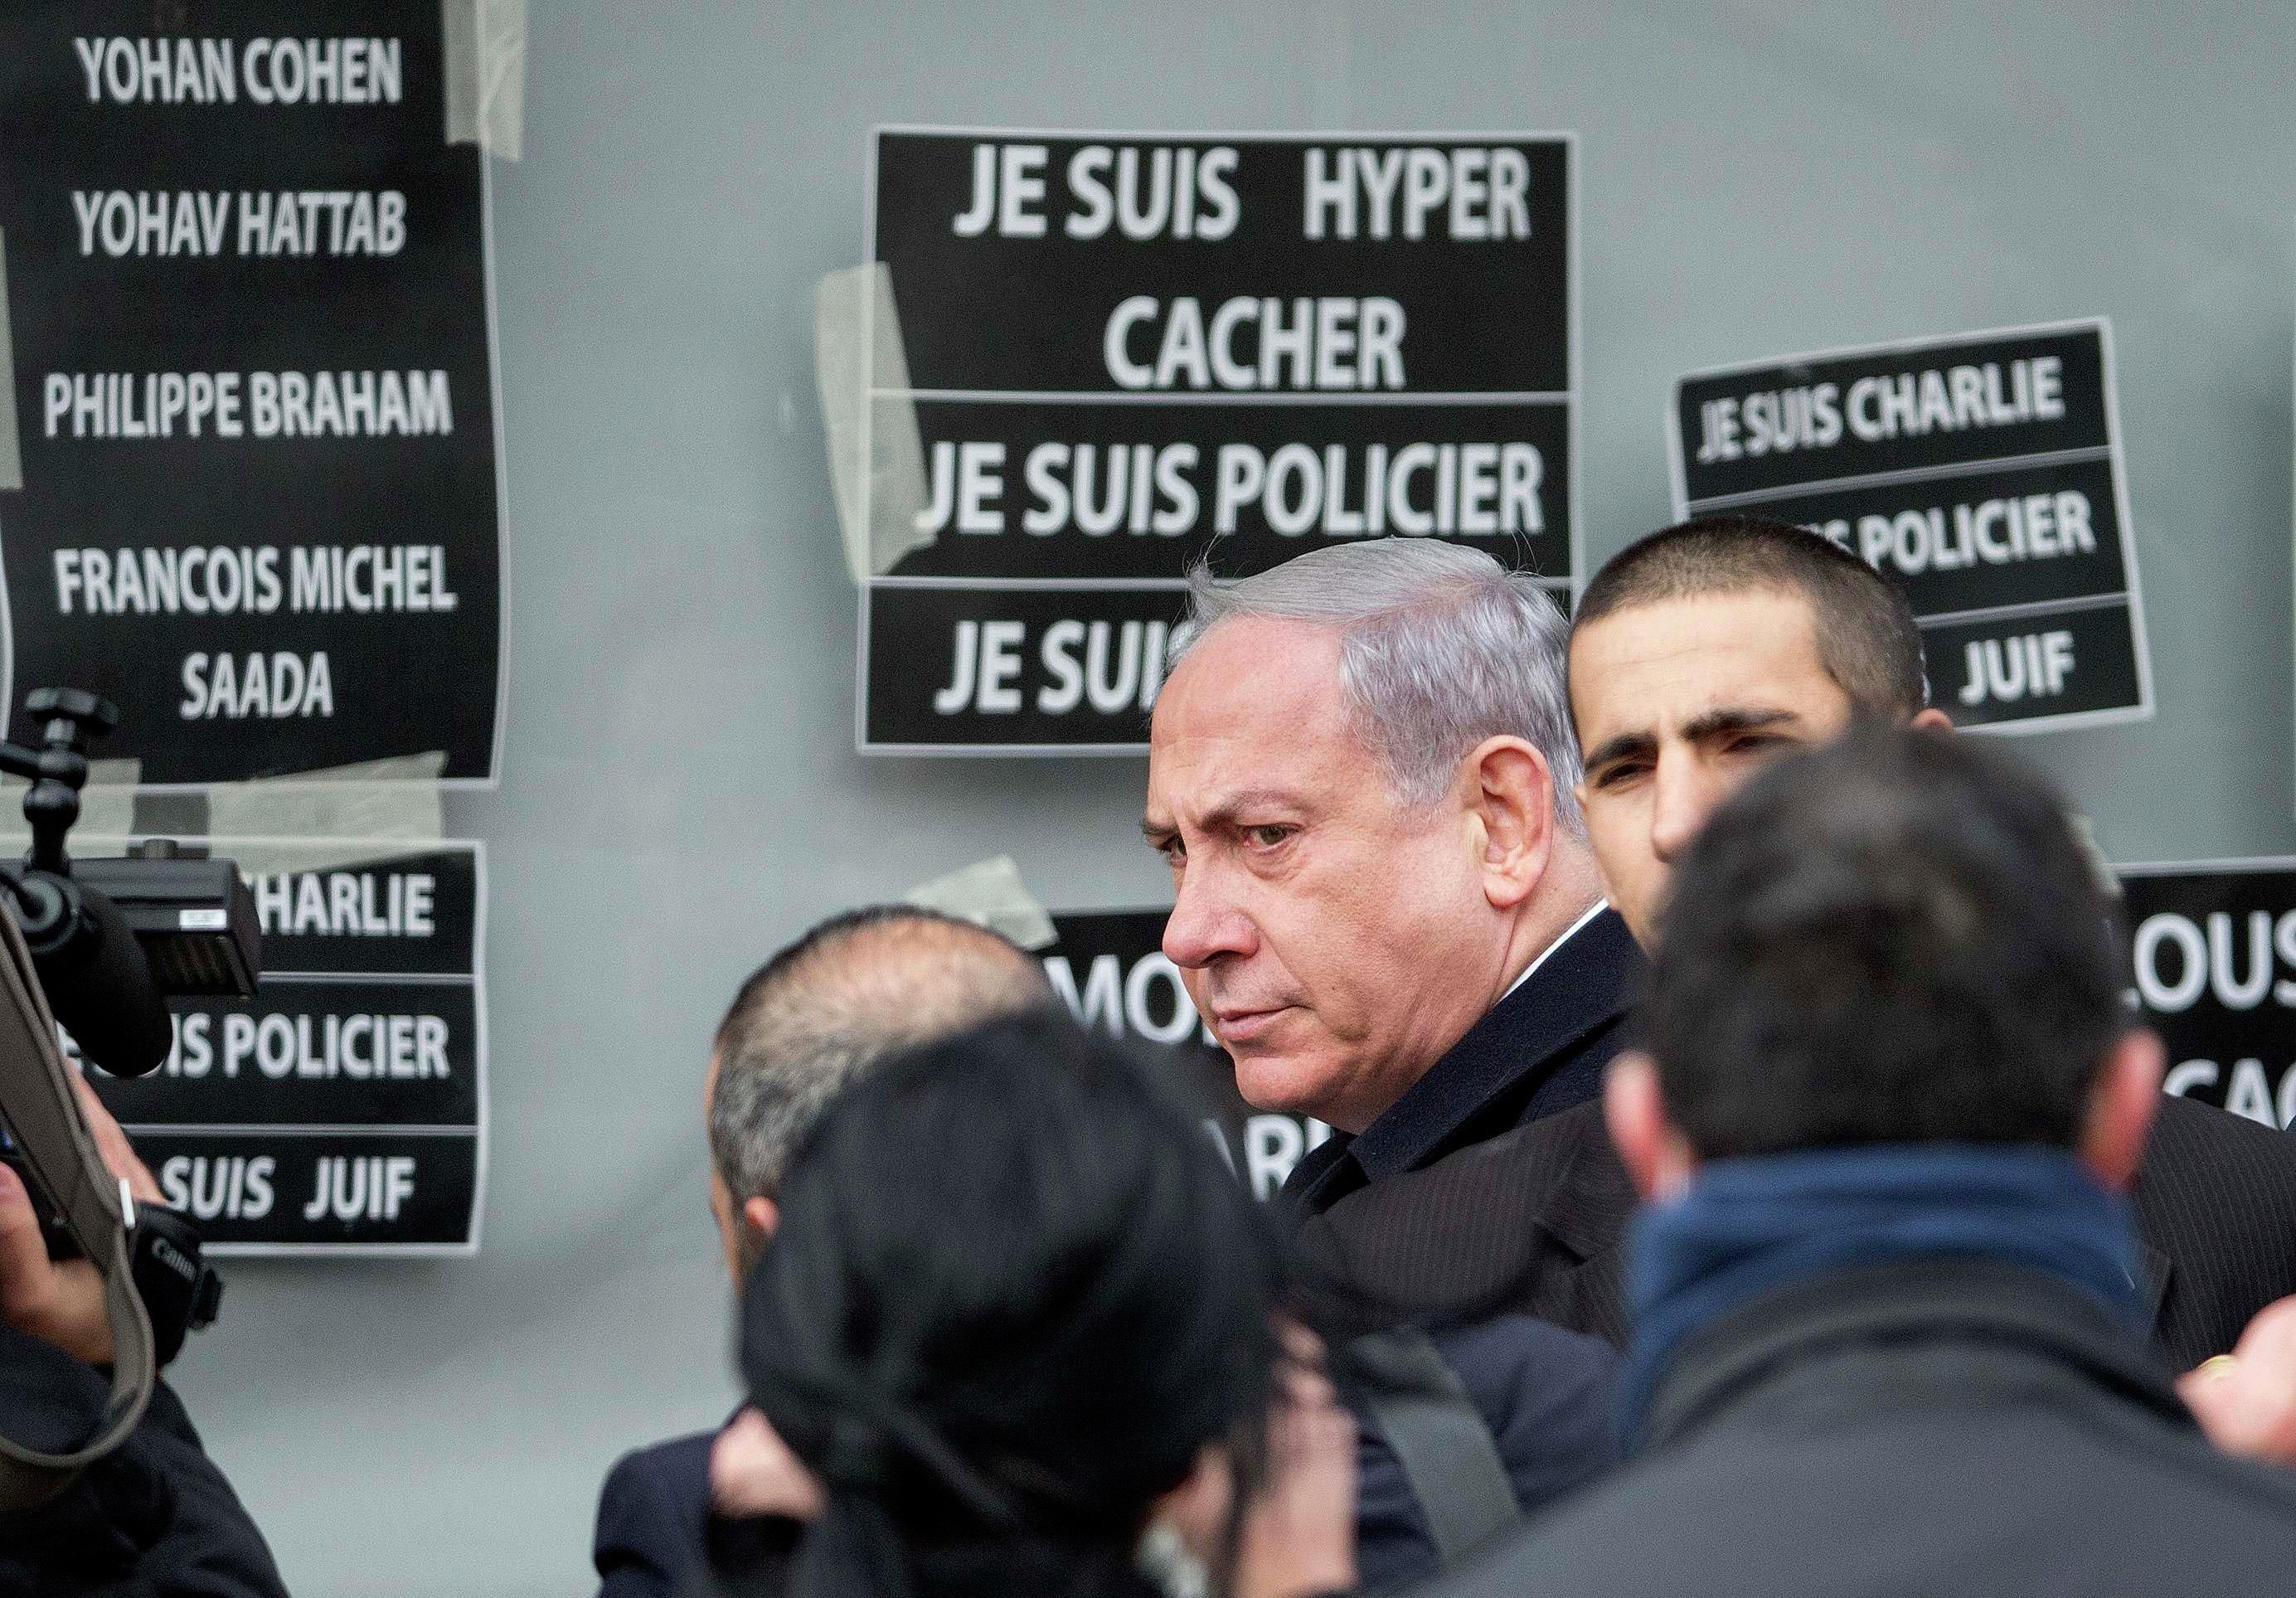 Israel's Prime Minister Benjamin Netanyahu arrives at the Hyper Cacher kosher supermarket January 12, 2015 near the Porte de Vincennes in Paris